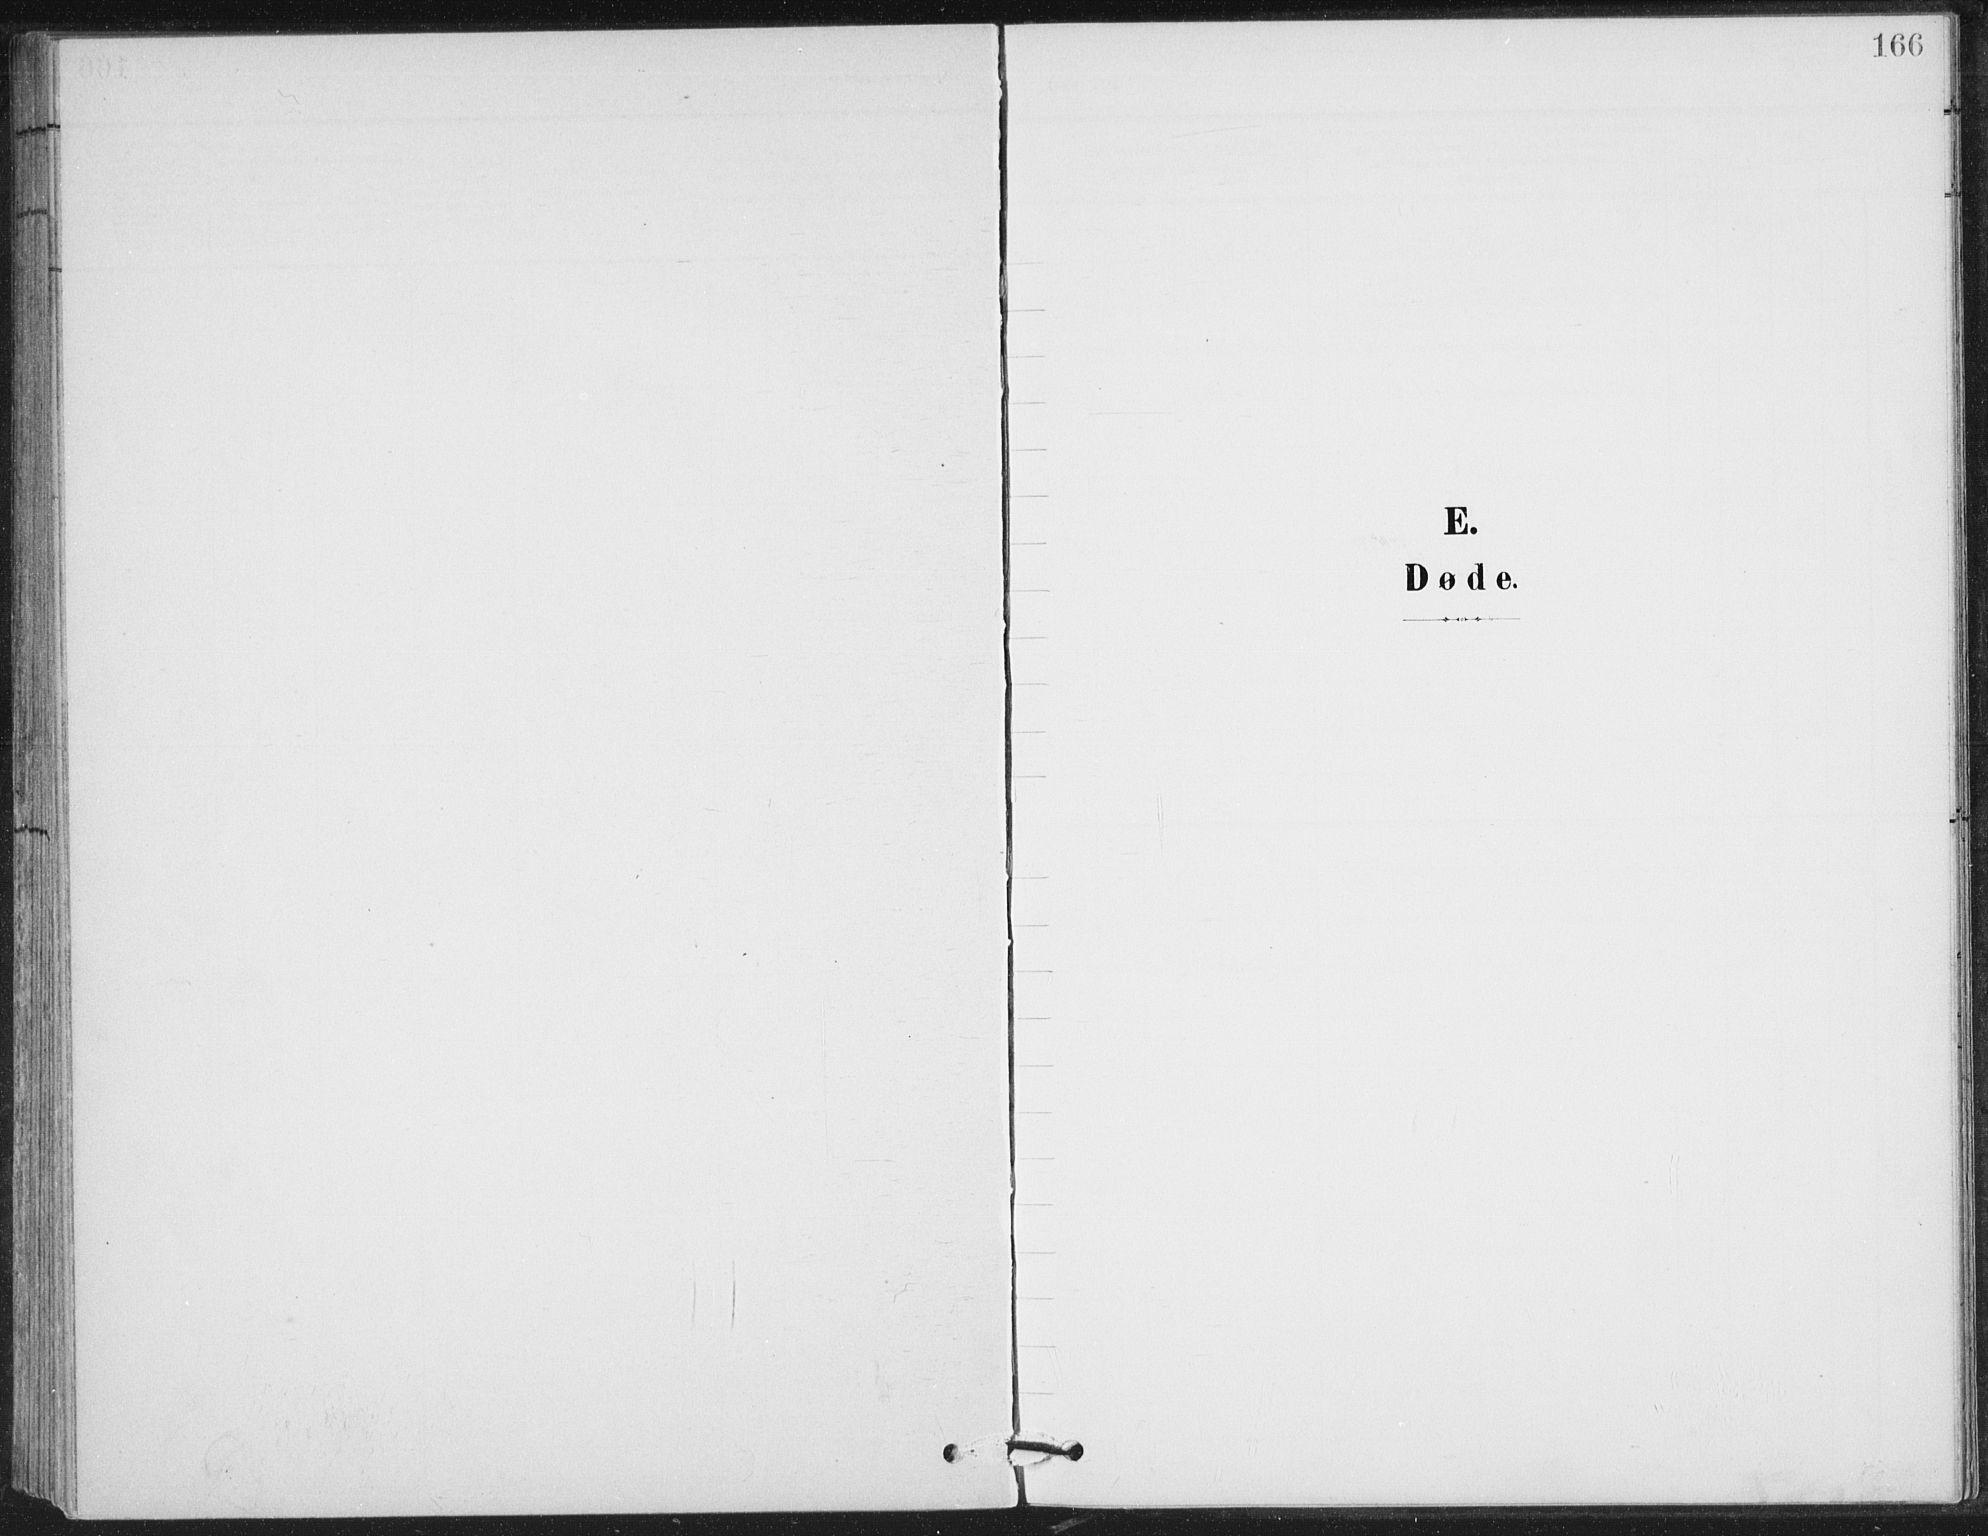 SAH, Vestre Gausdal prestekontor, Klokkerbok nr. 4, 1898-1939, s. 166